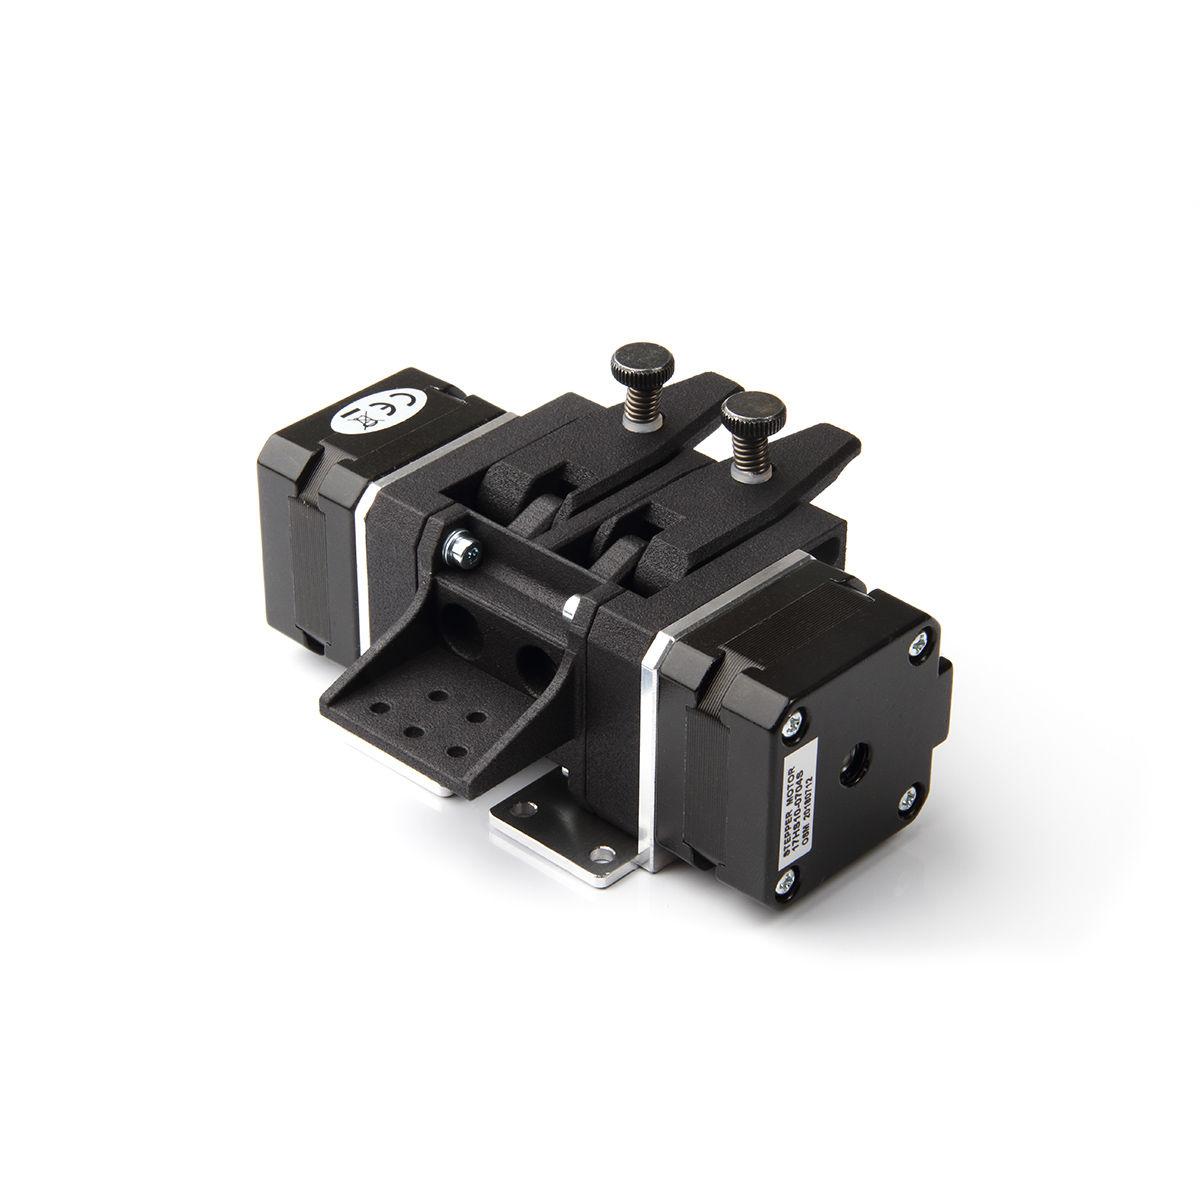 Bondtech - BMG-X2 Extruder - 3D Printer Spare Parts